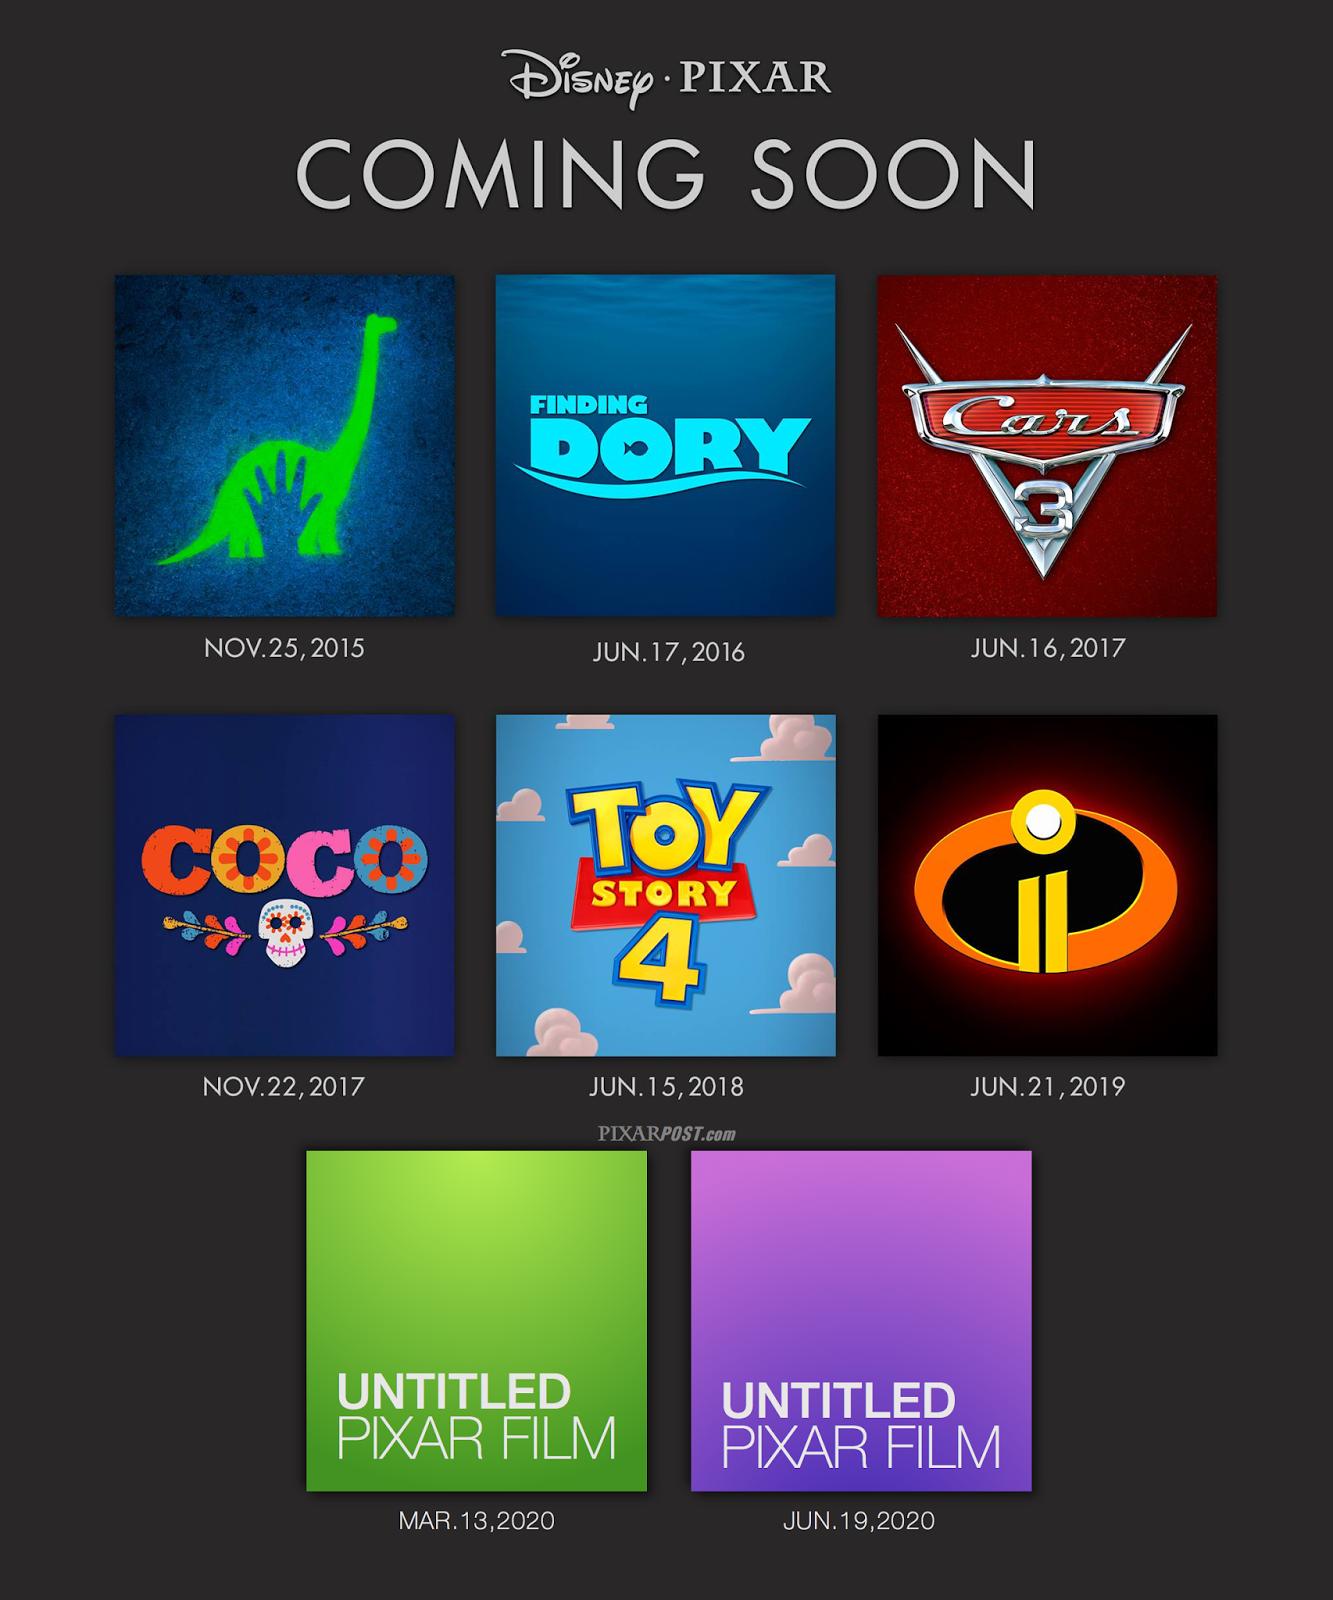 Pair of Untitled Pixar Films Coming in 2020 Disney pixar